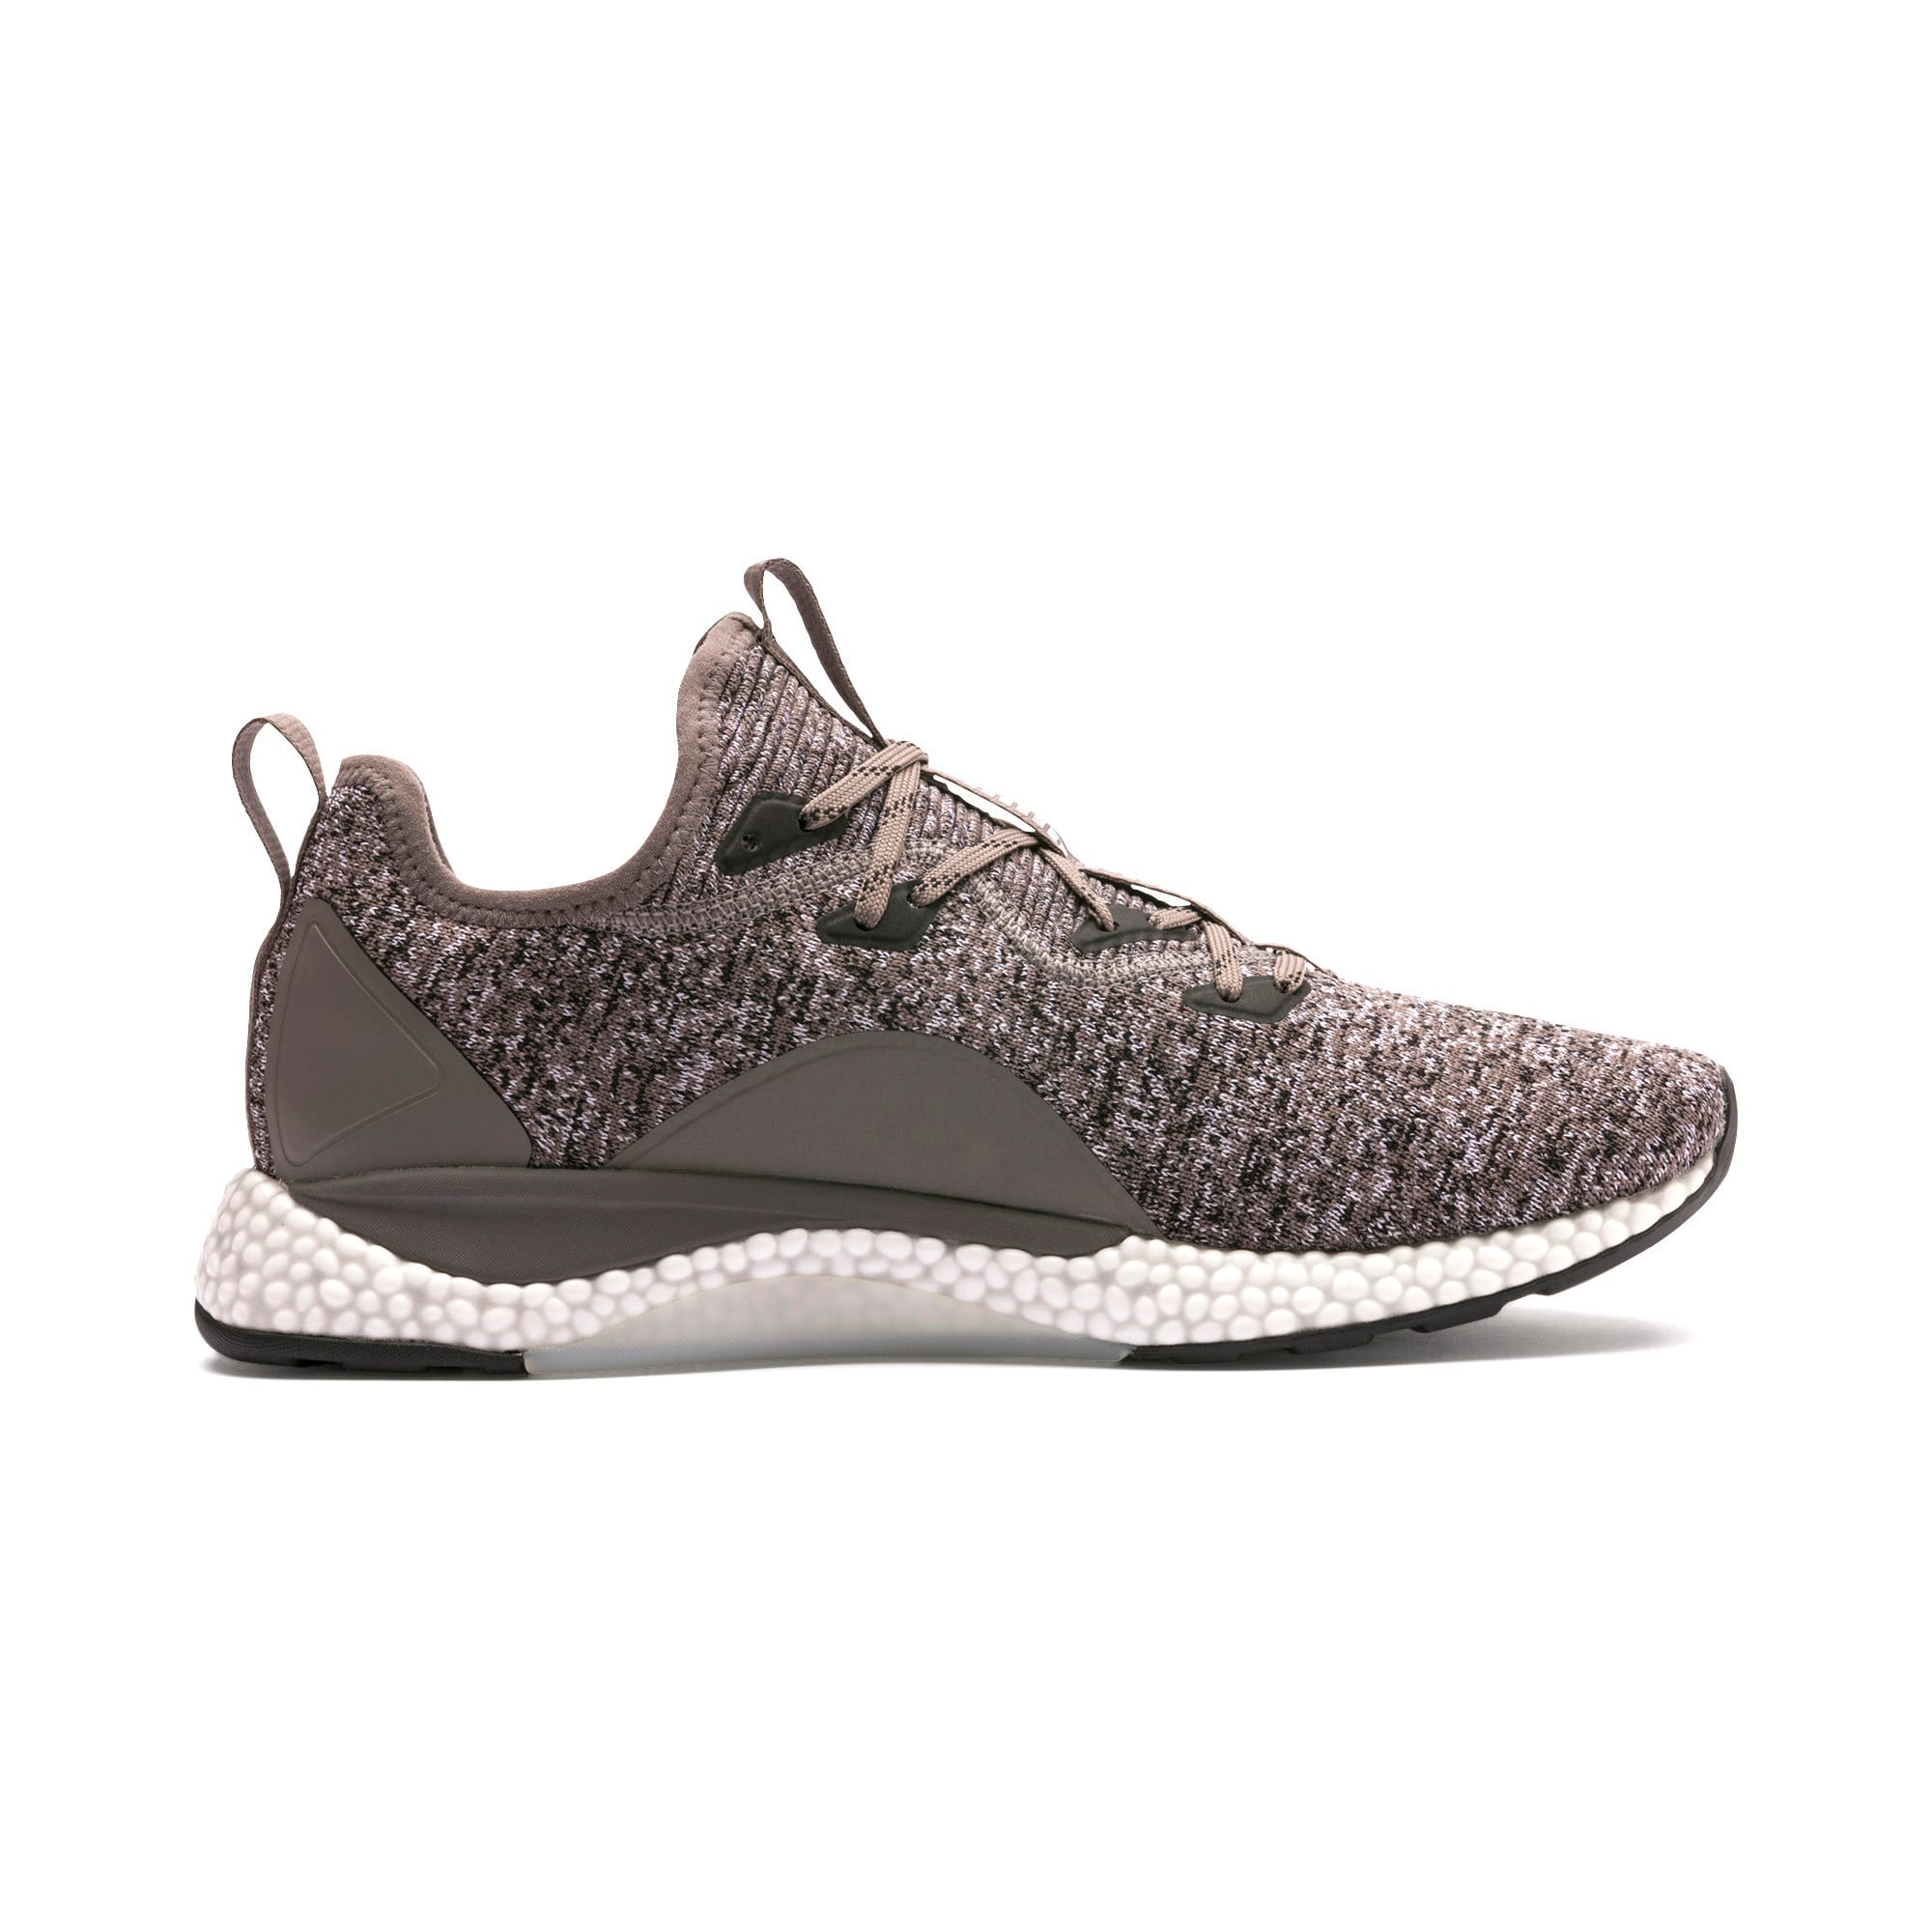 Thumbnail 6 of Hybrid Runner Men's Running Shoes, Charcoal Gray-Puma White, medium-IND